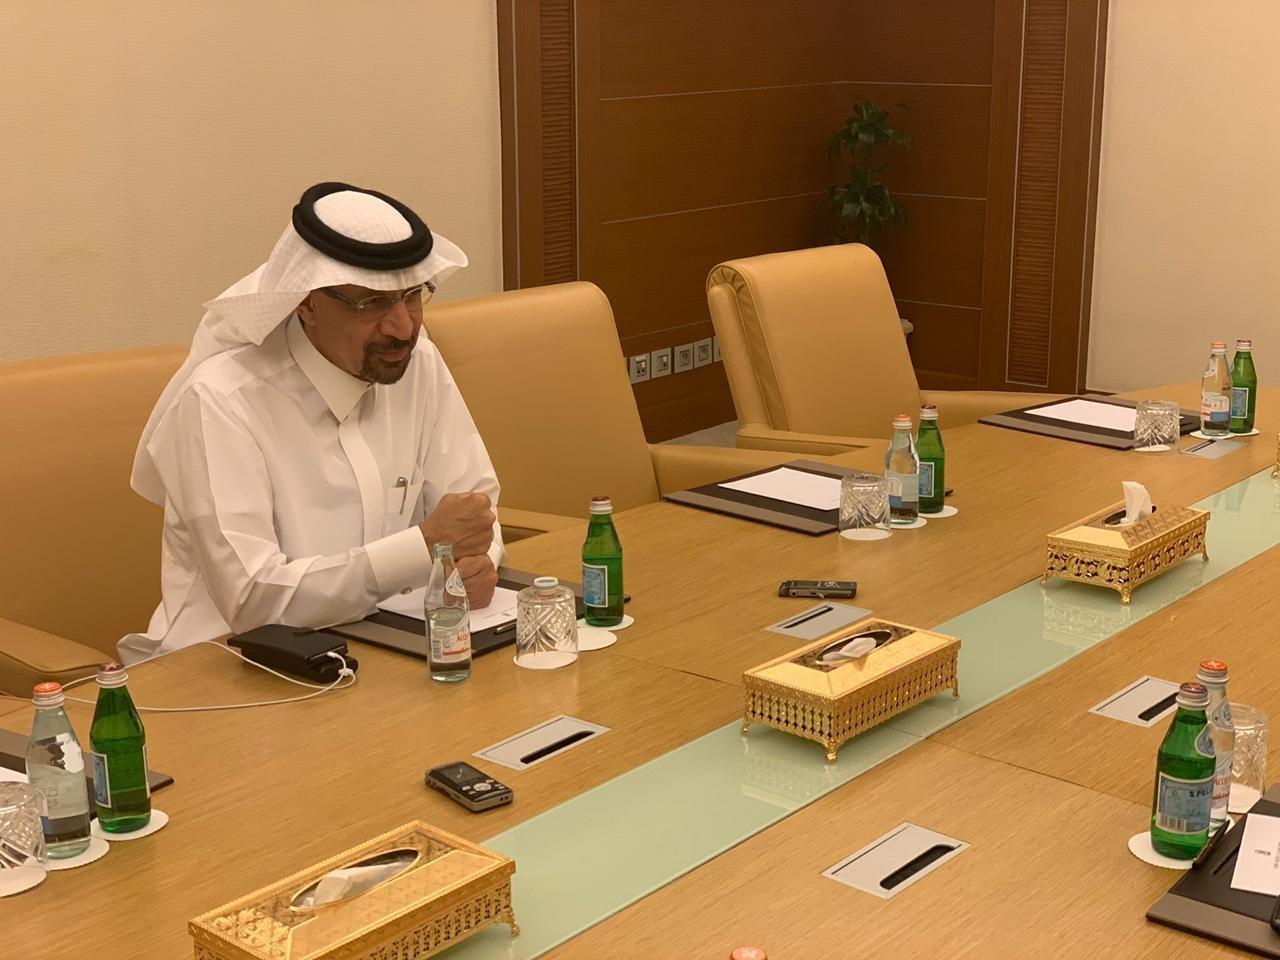 Minister of Energy of Saudi Arabia Khalid A. Al-Falih